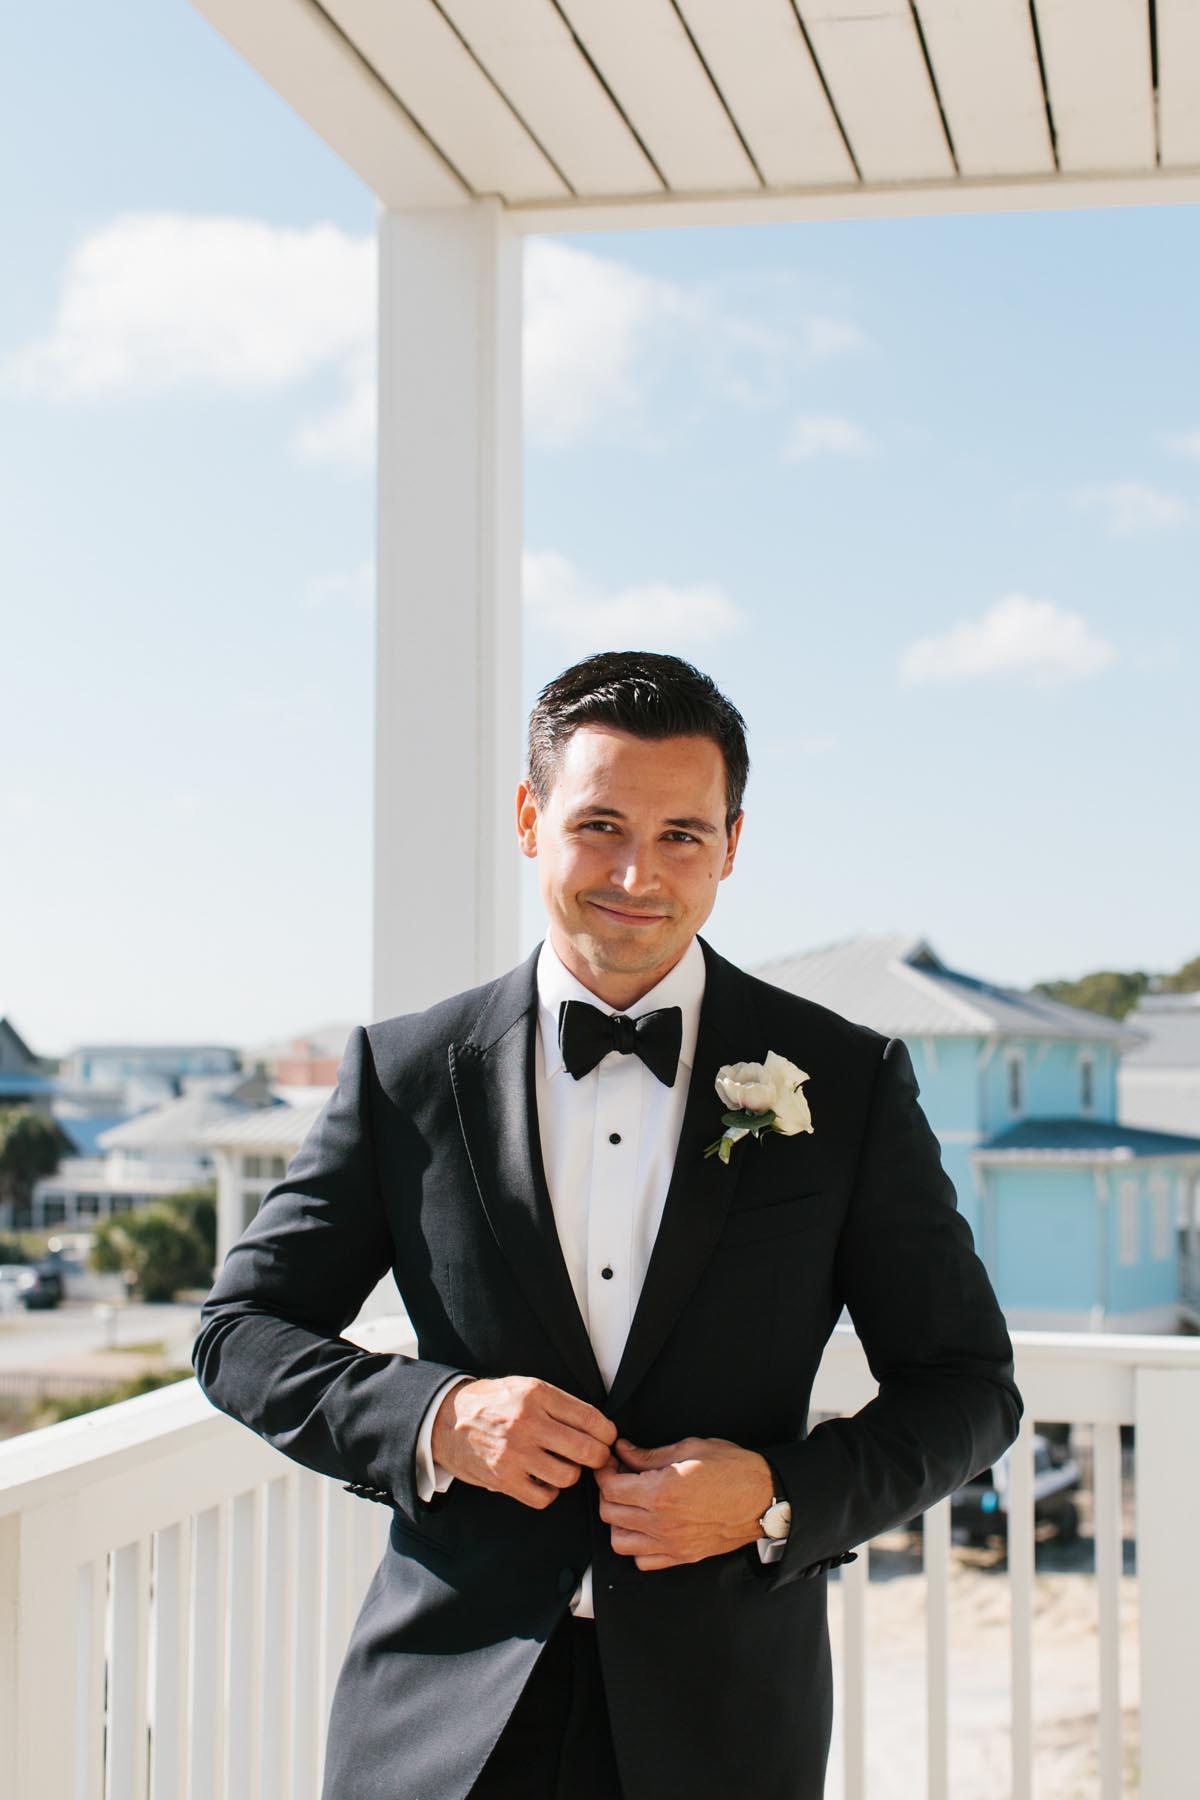 lowry wedding blog eden garden florida wedding-50